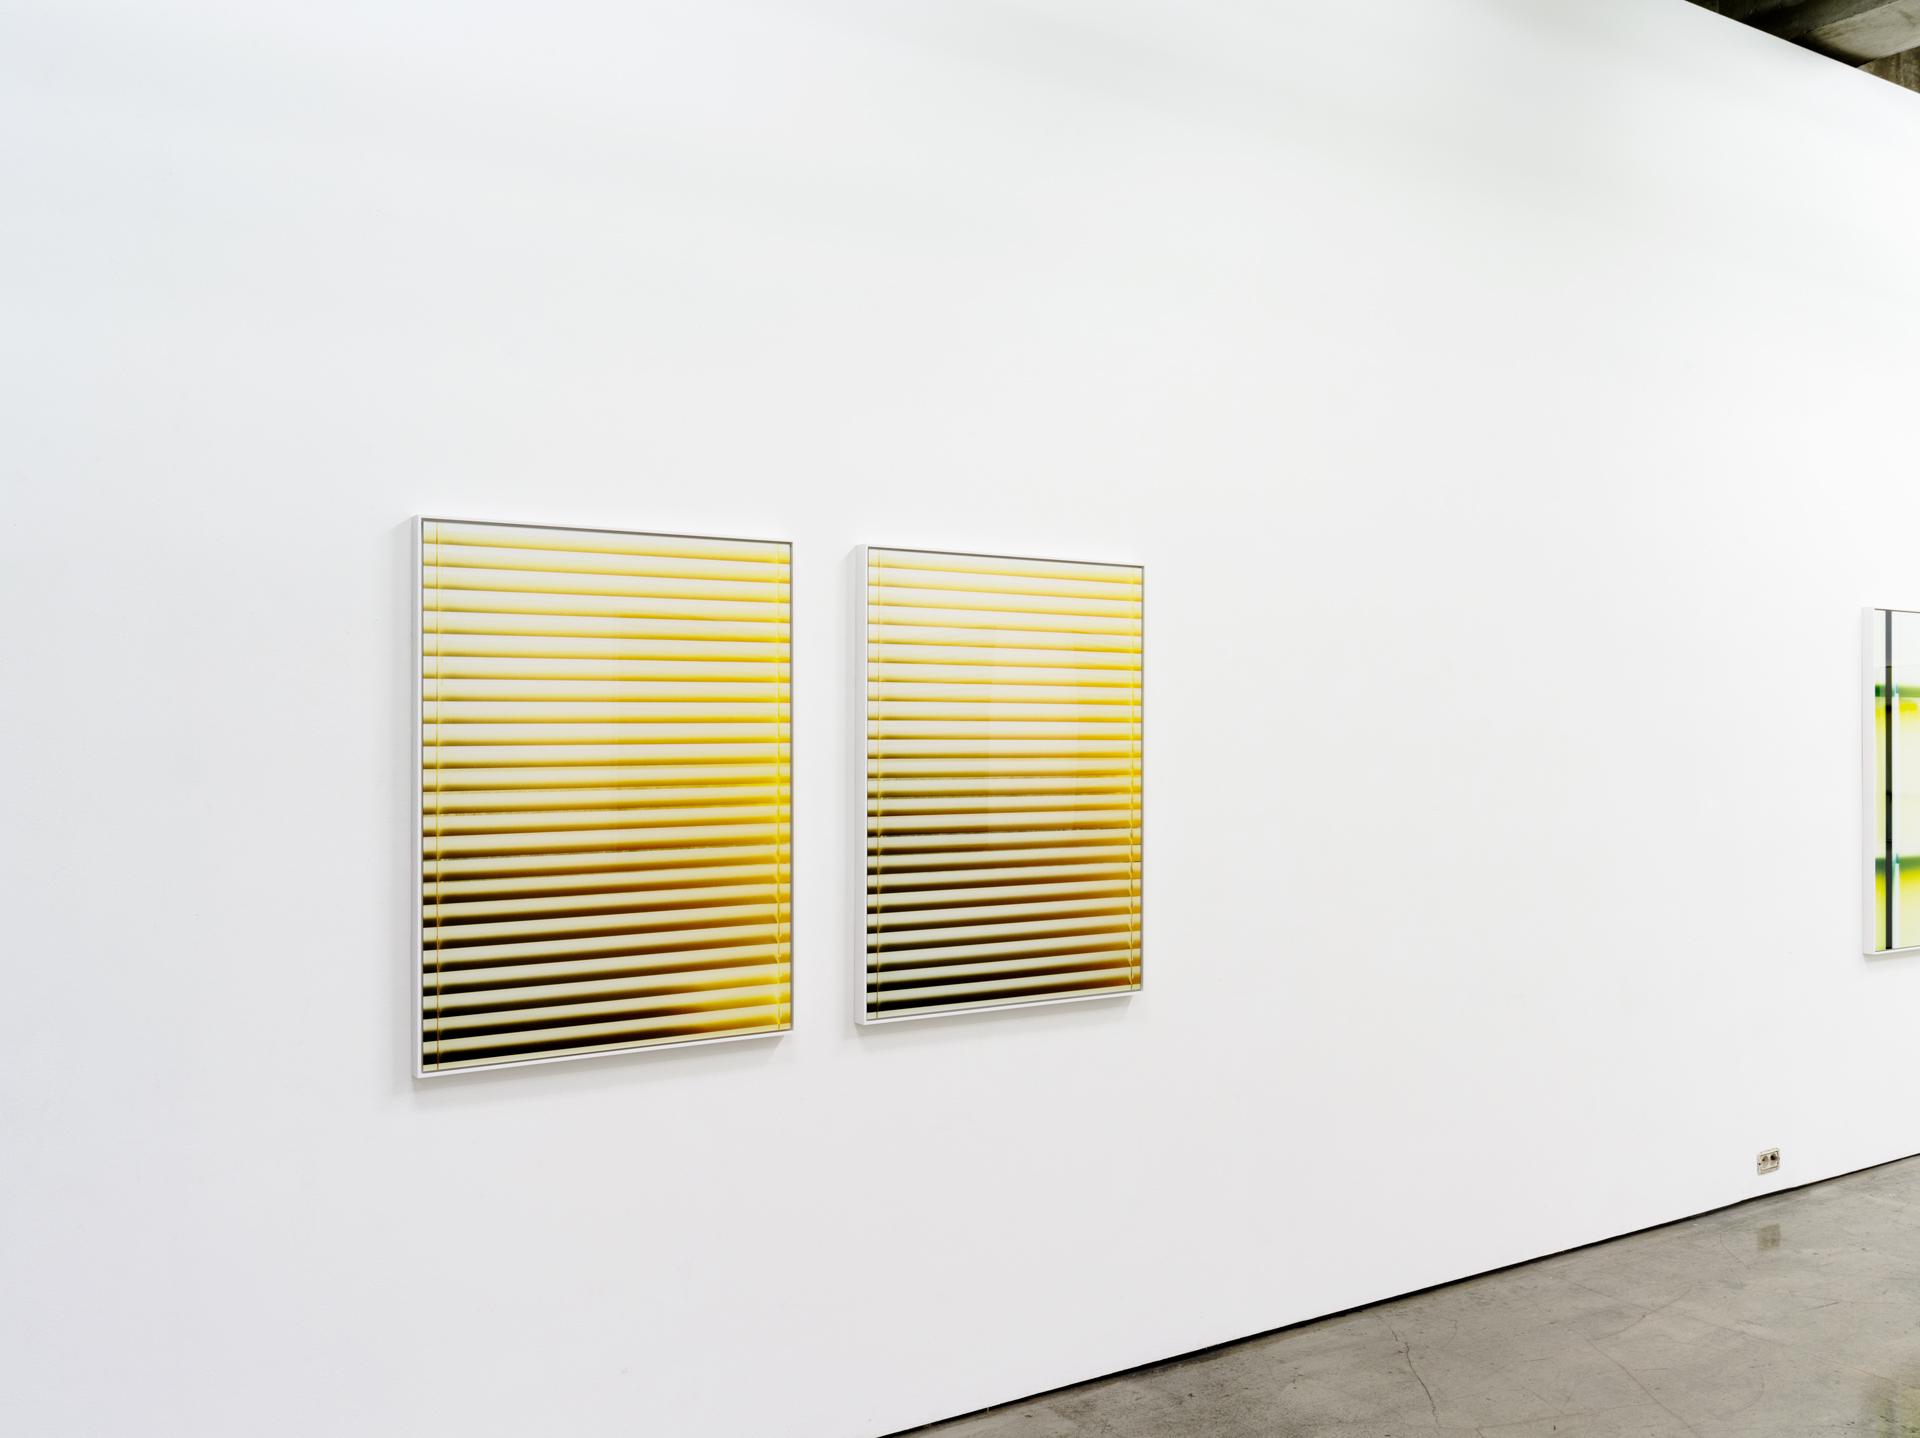 2016, Bundo Gallery 04